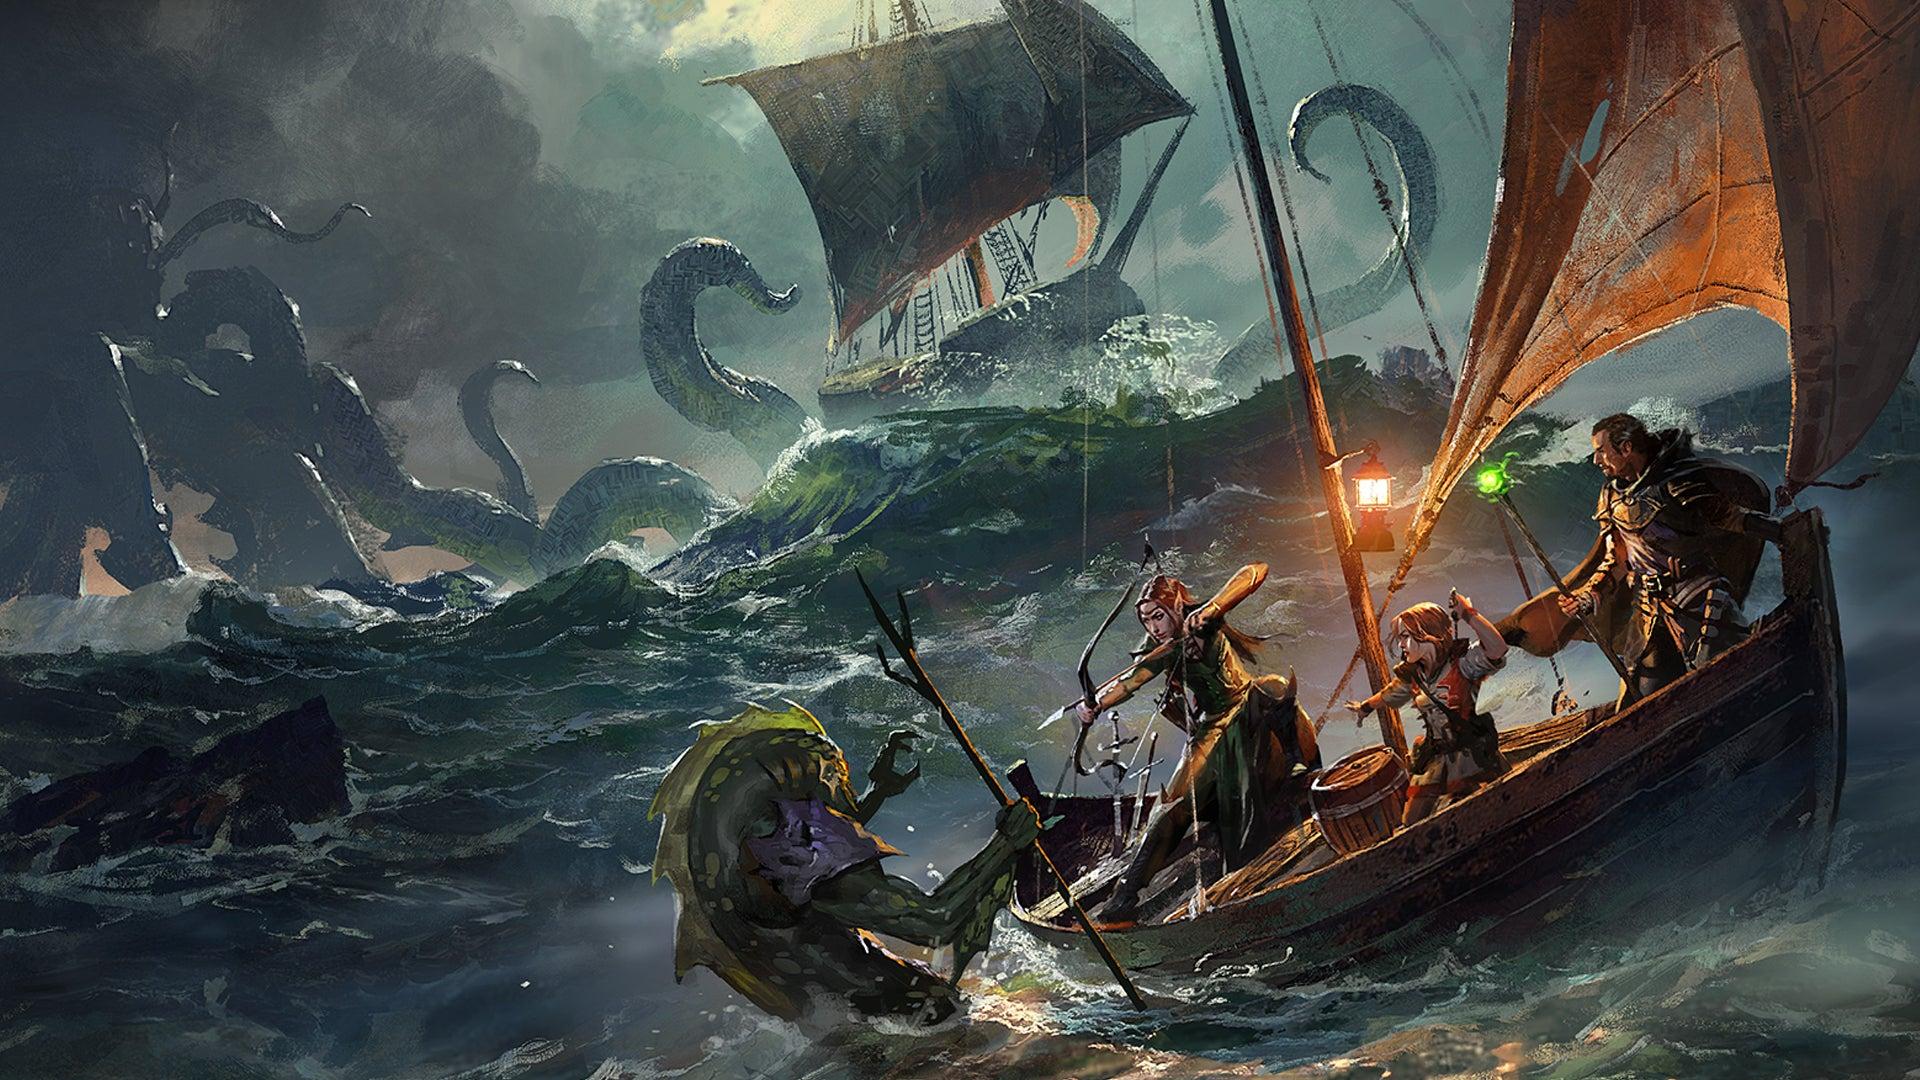 Dungeons & Dragons roleplaying game artwork 17